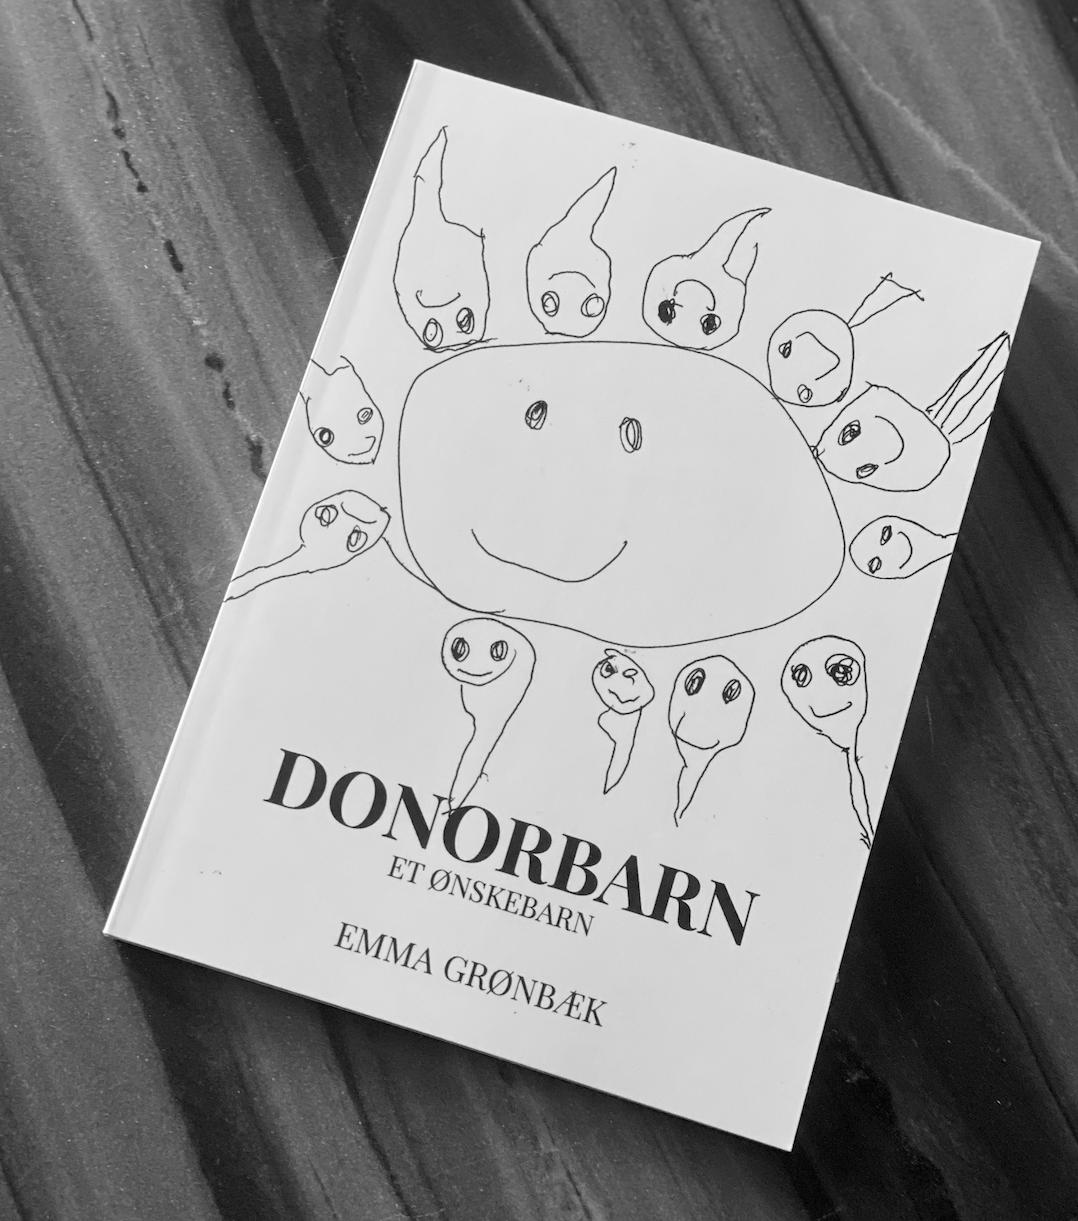 Emma Grønbæk - Donorbarn Et Ønskebarn